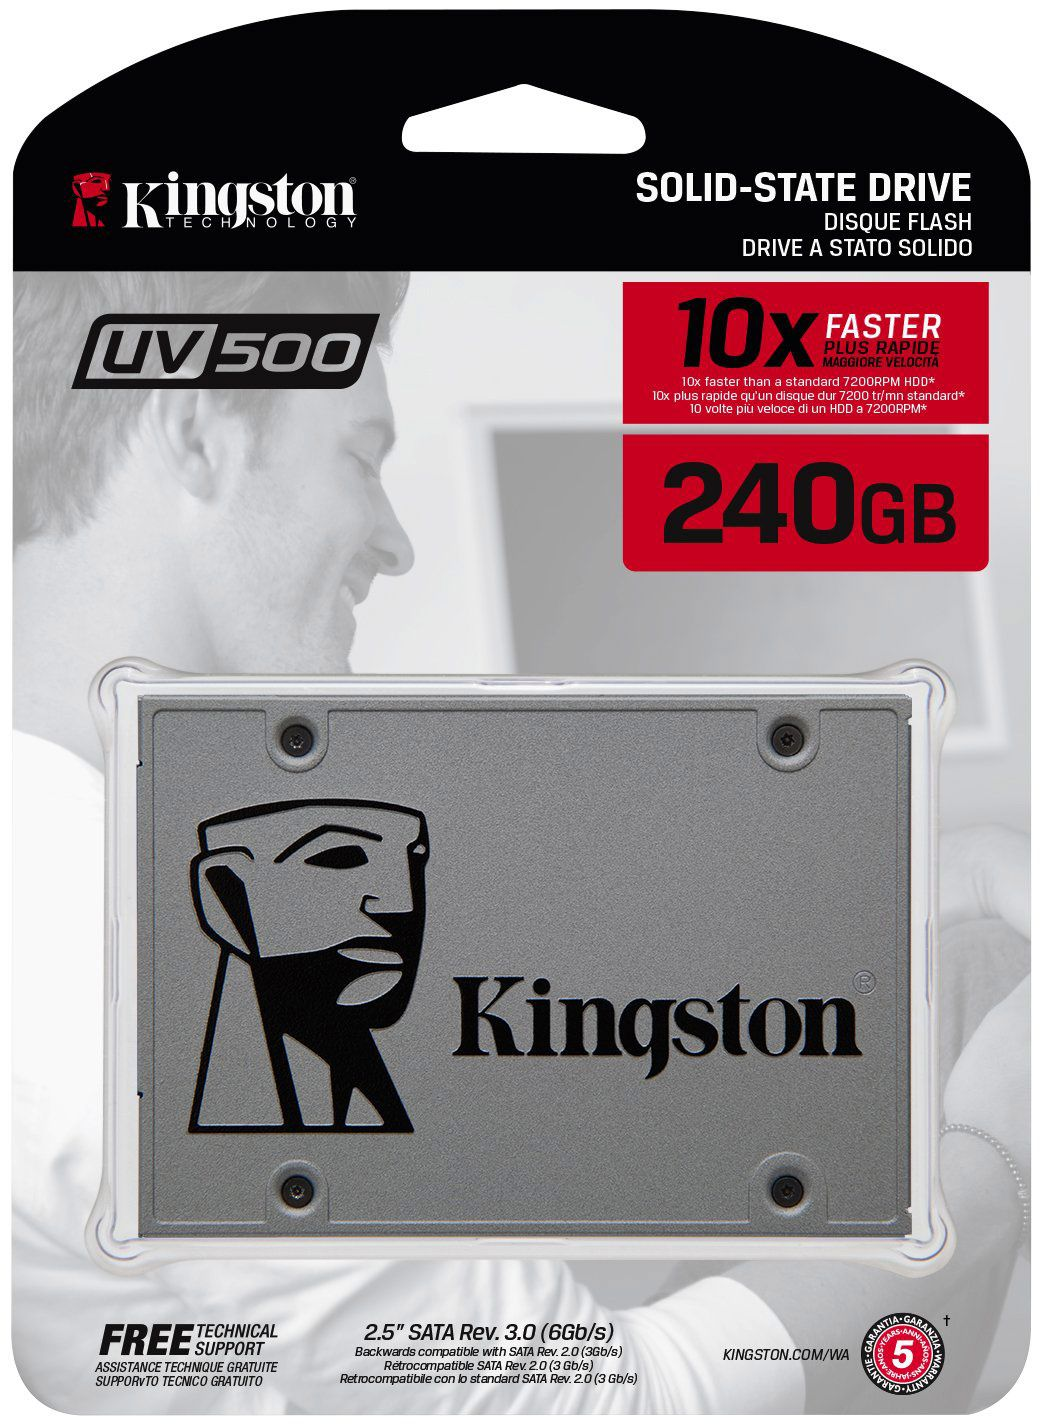 SSD 240GB - SUV500/240G SATAIII  UV500 - Kingston